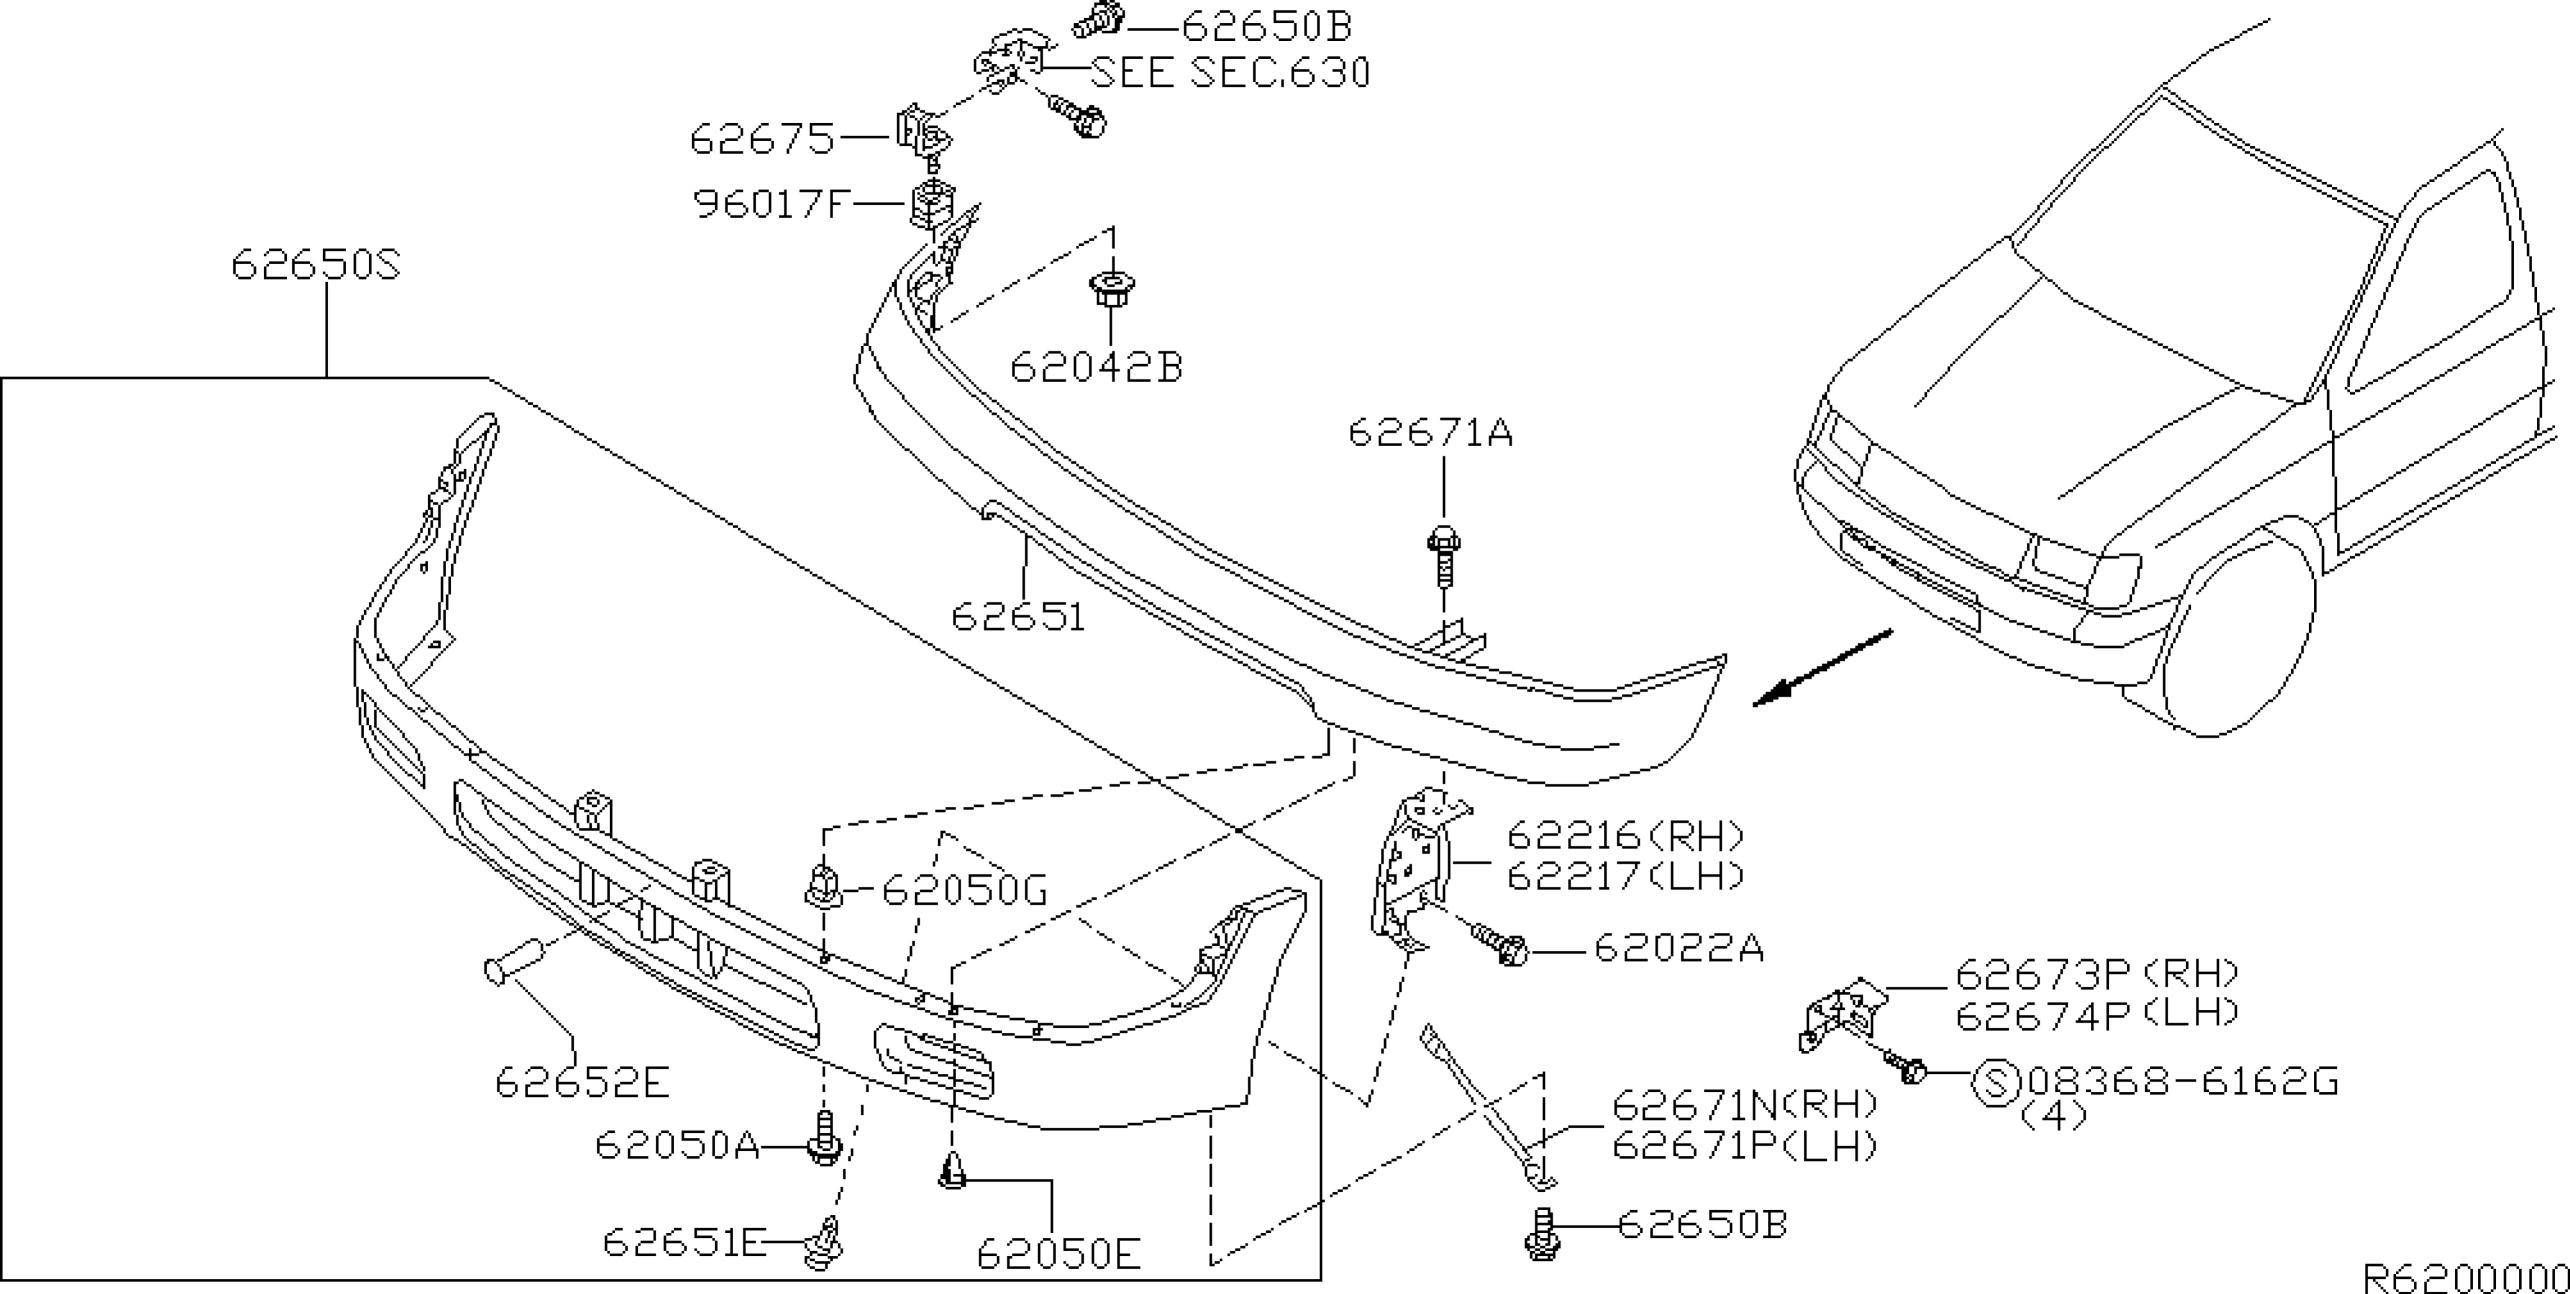 2003 Nissan Xterra Belt Diagram Trusted Wiring For 2001 Engine Diy Diagrams U2022 Lincoln Town Car